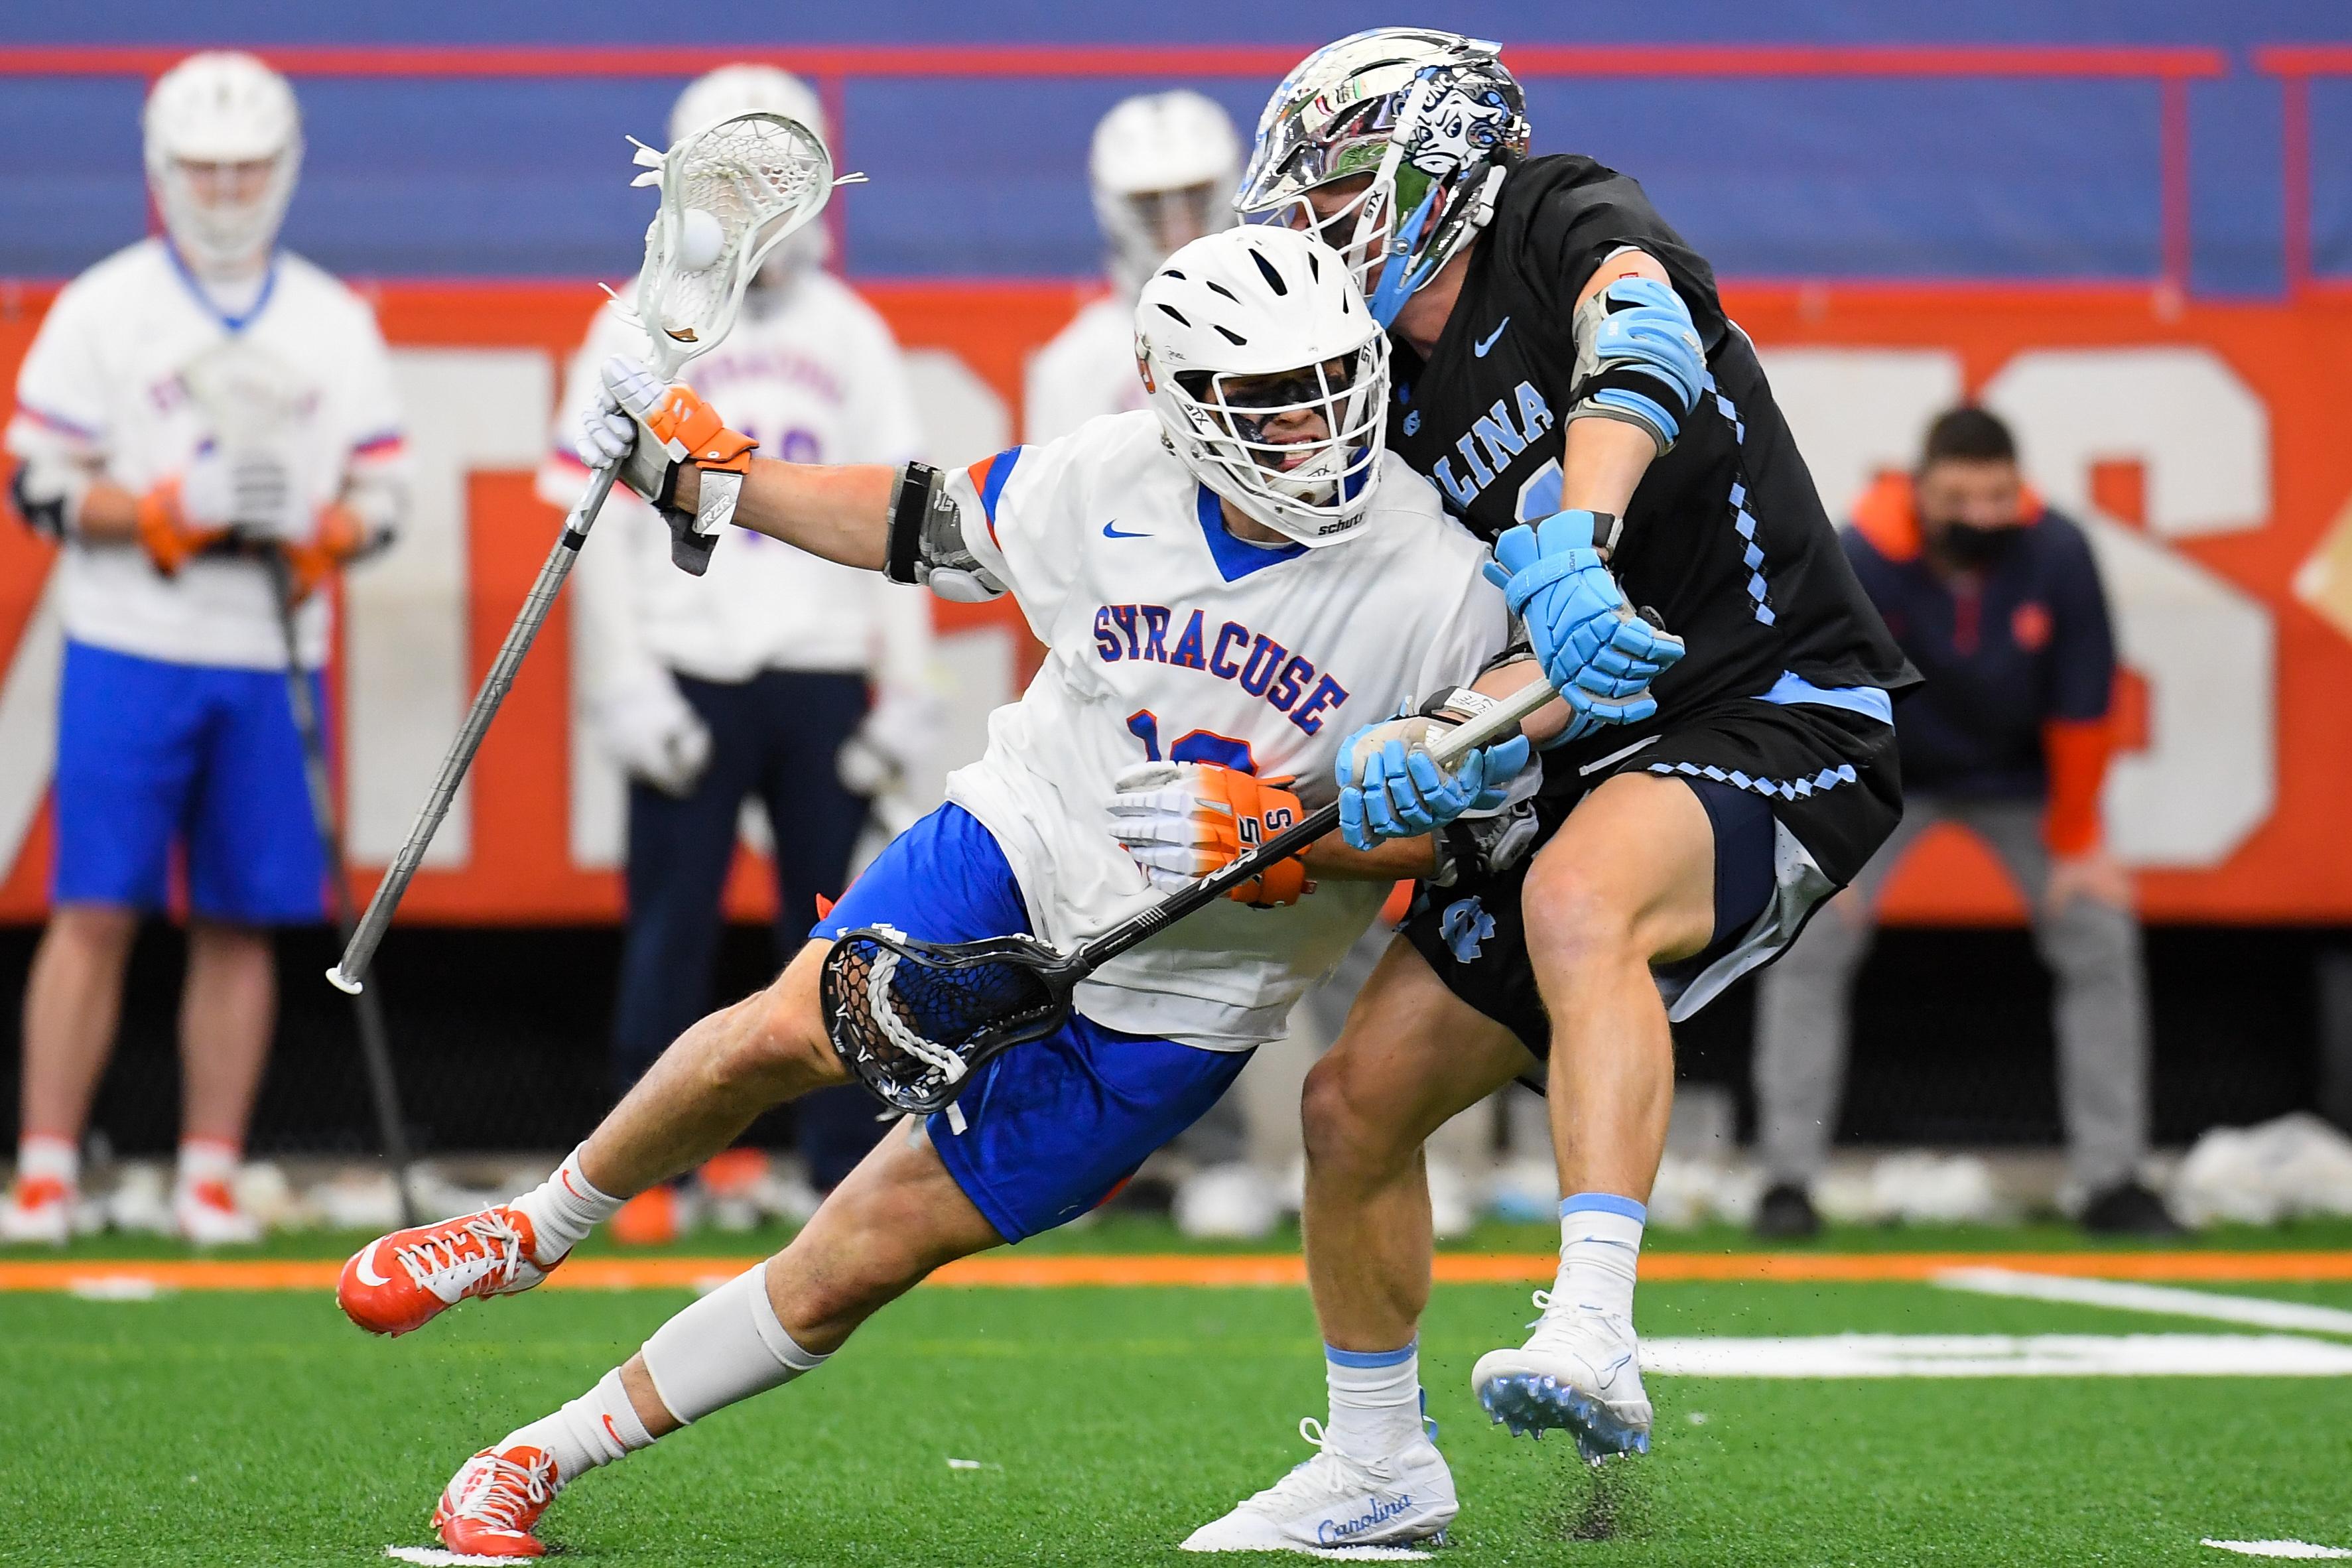 NCAA Lacrosse: North Carolina at Syracuse